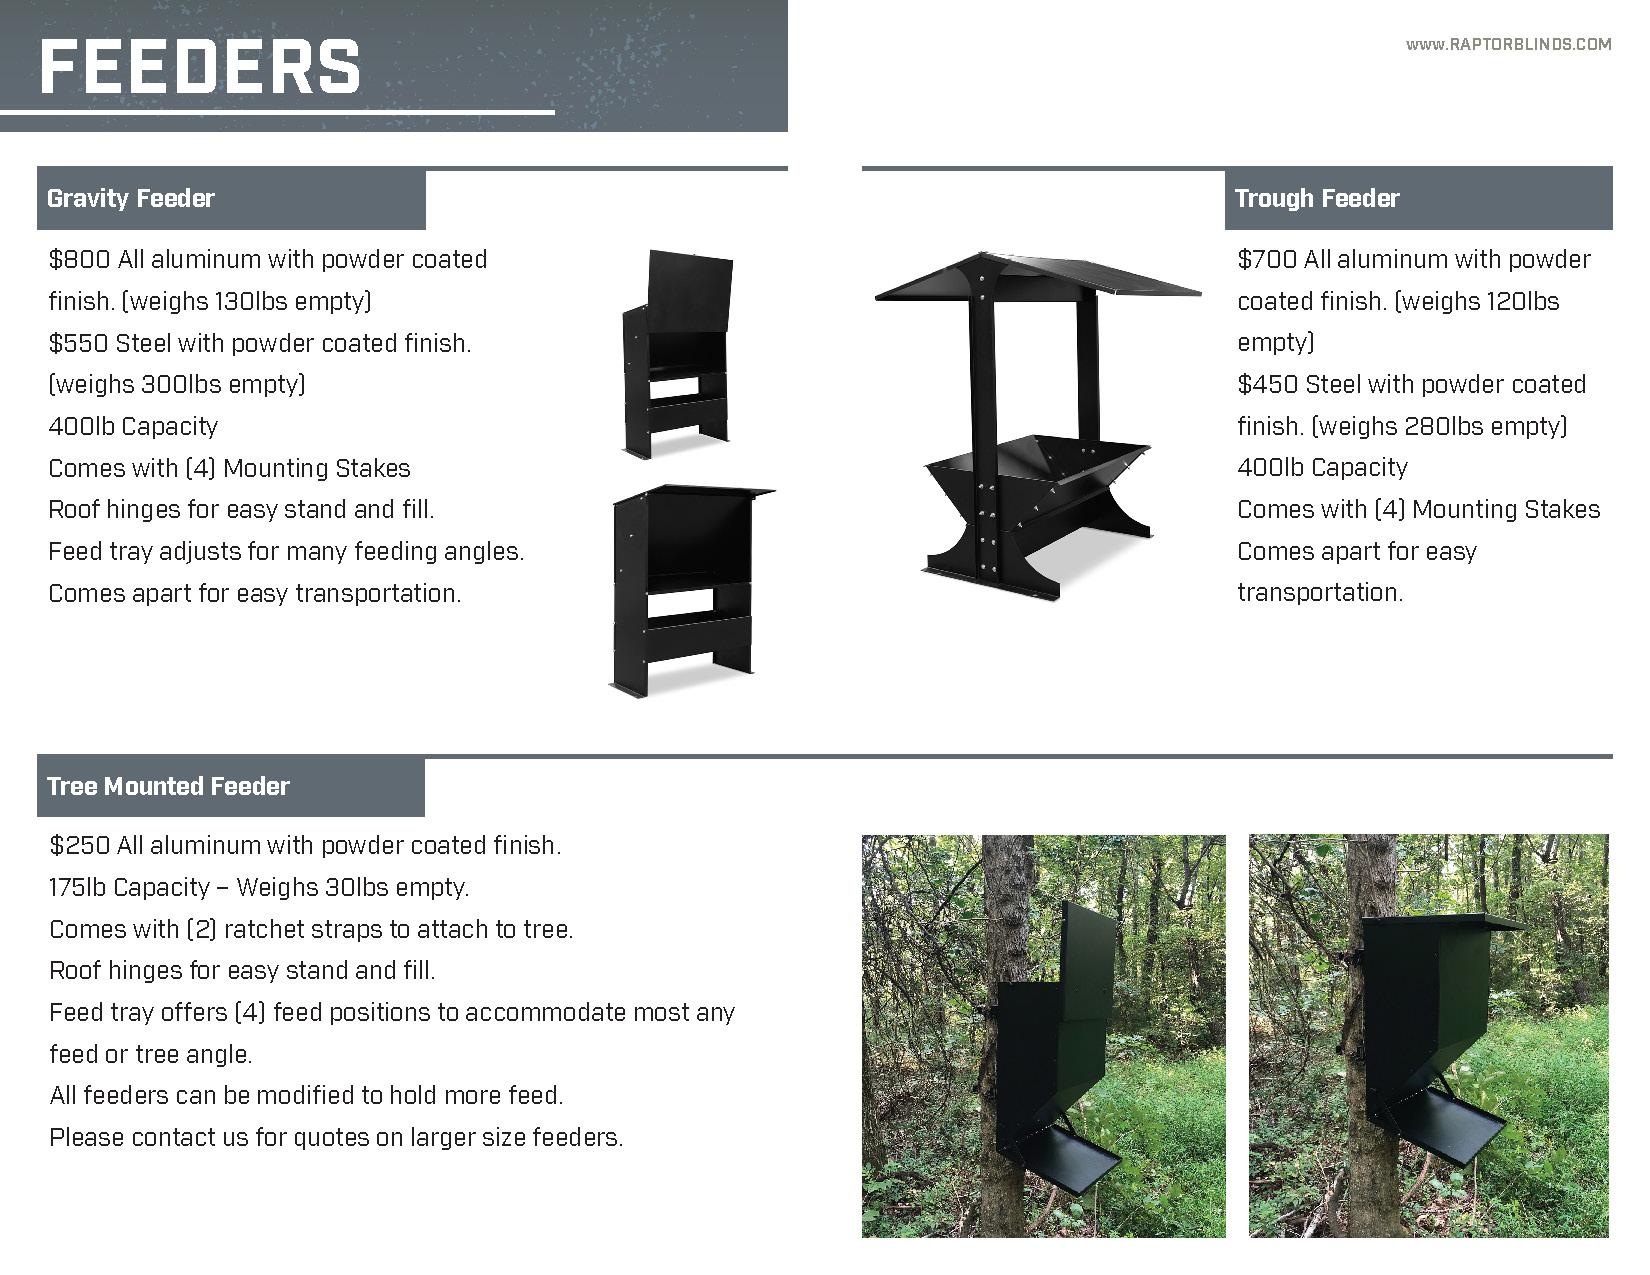 Raptor Blinds Catalog Spread pages 5-6